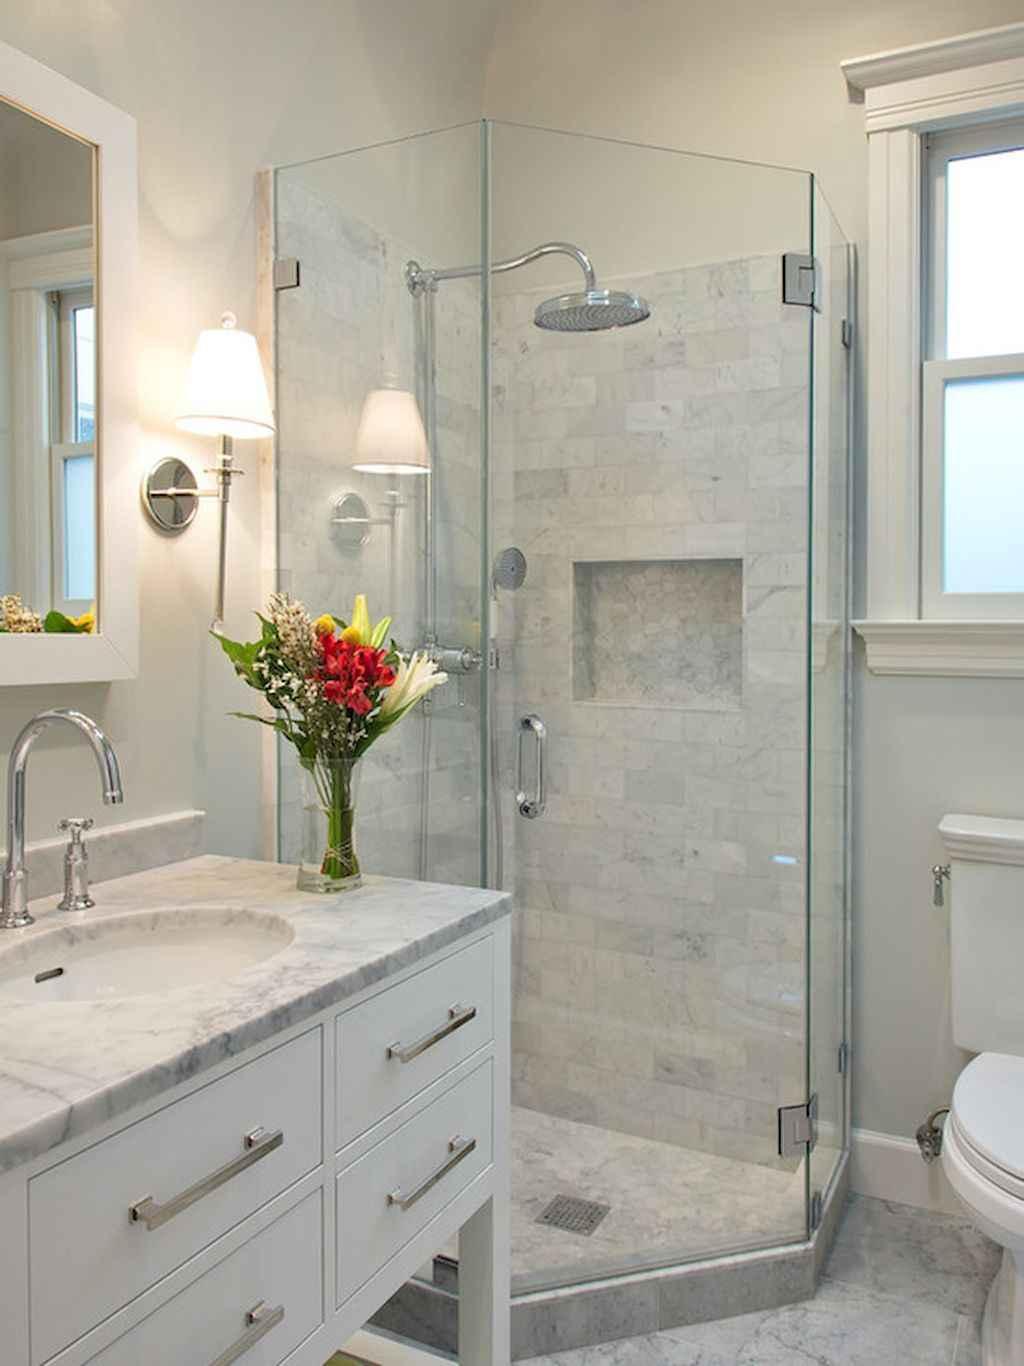 Inspiring apartment bathroom remodel ideas on a budget (6)